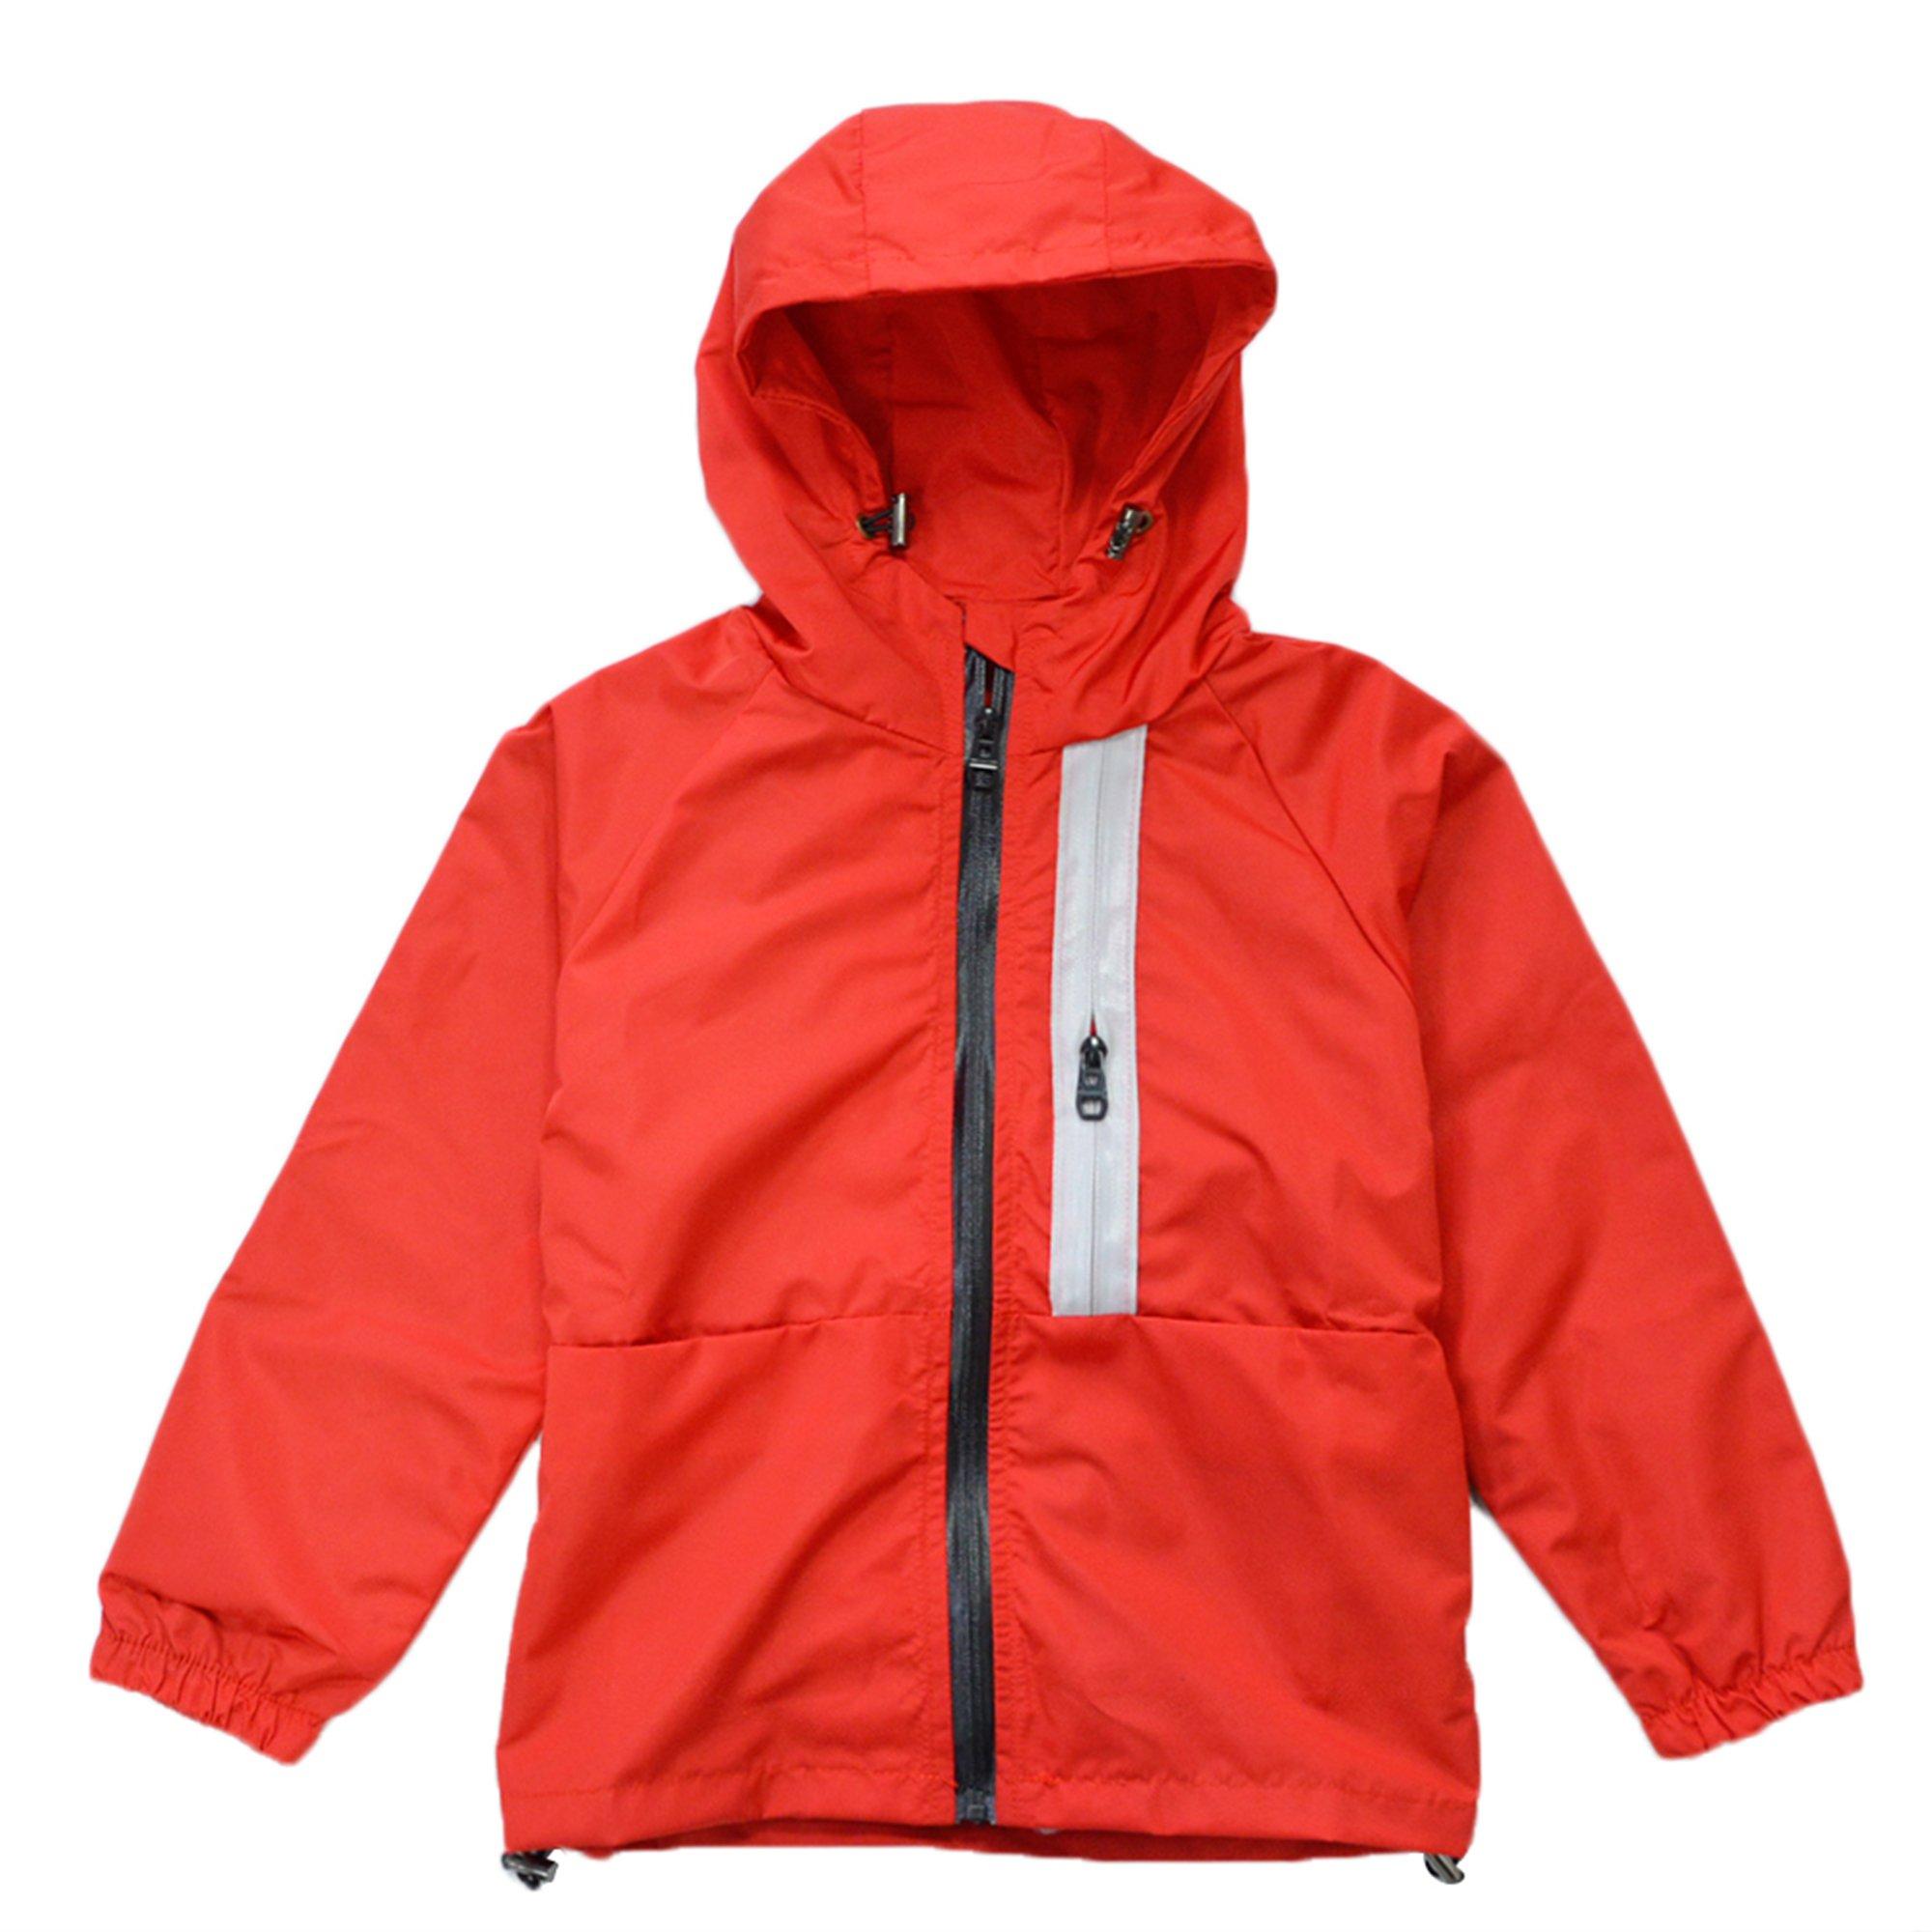 KISBINI Big Boys Kids Hoodies Rain Coat Zip Jacket Spring Dustcoat Windbreakers Red